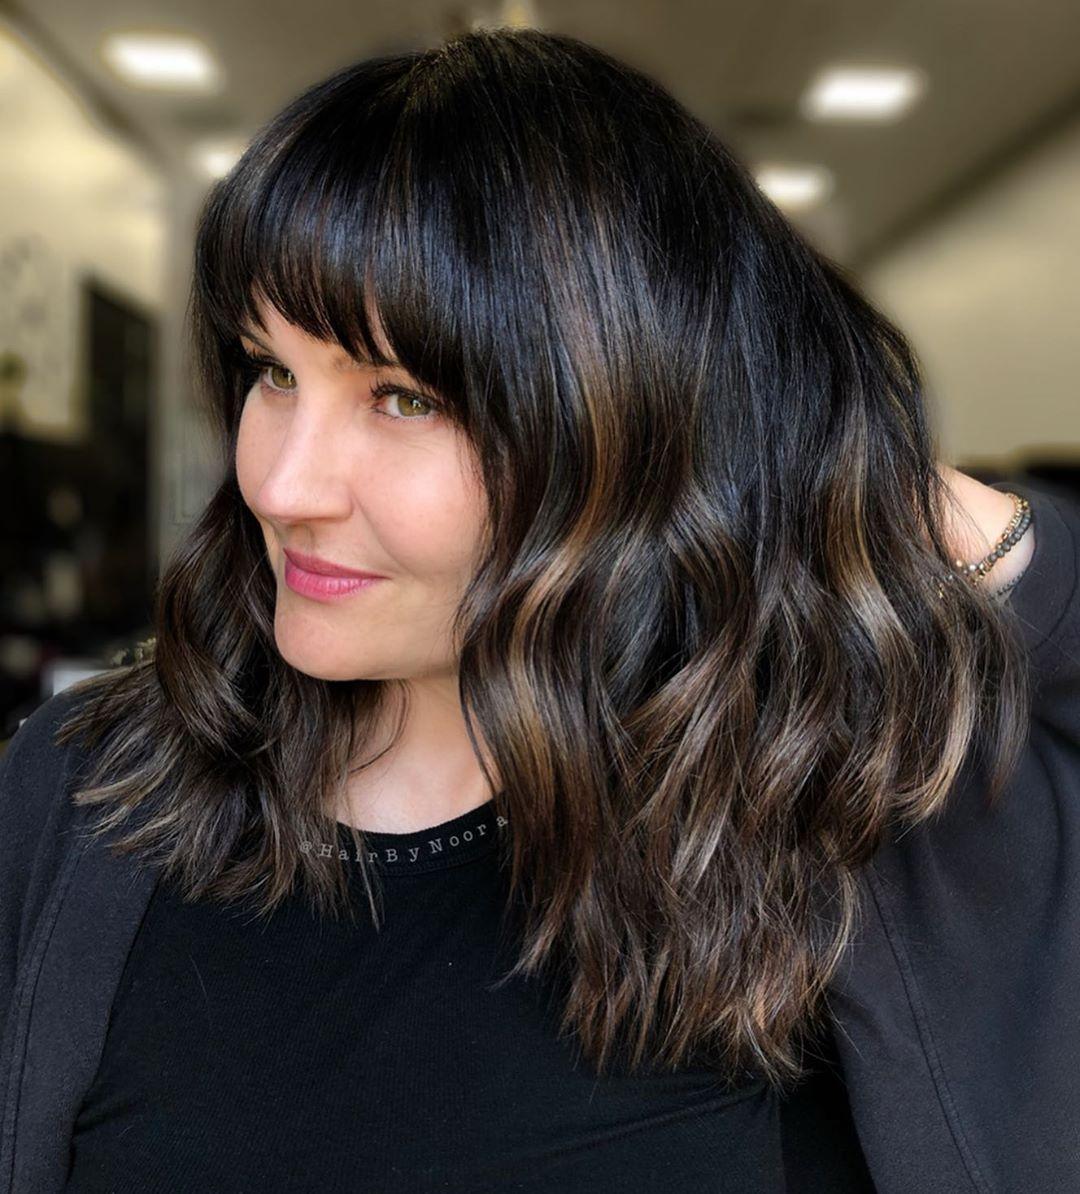 Стрижки после 50 лет на средние волосы 2020 фото 5